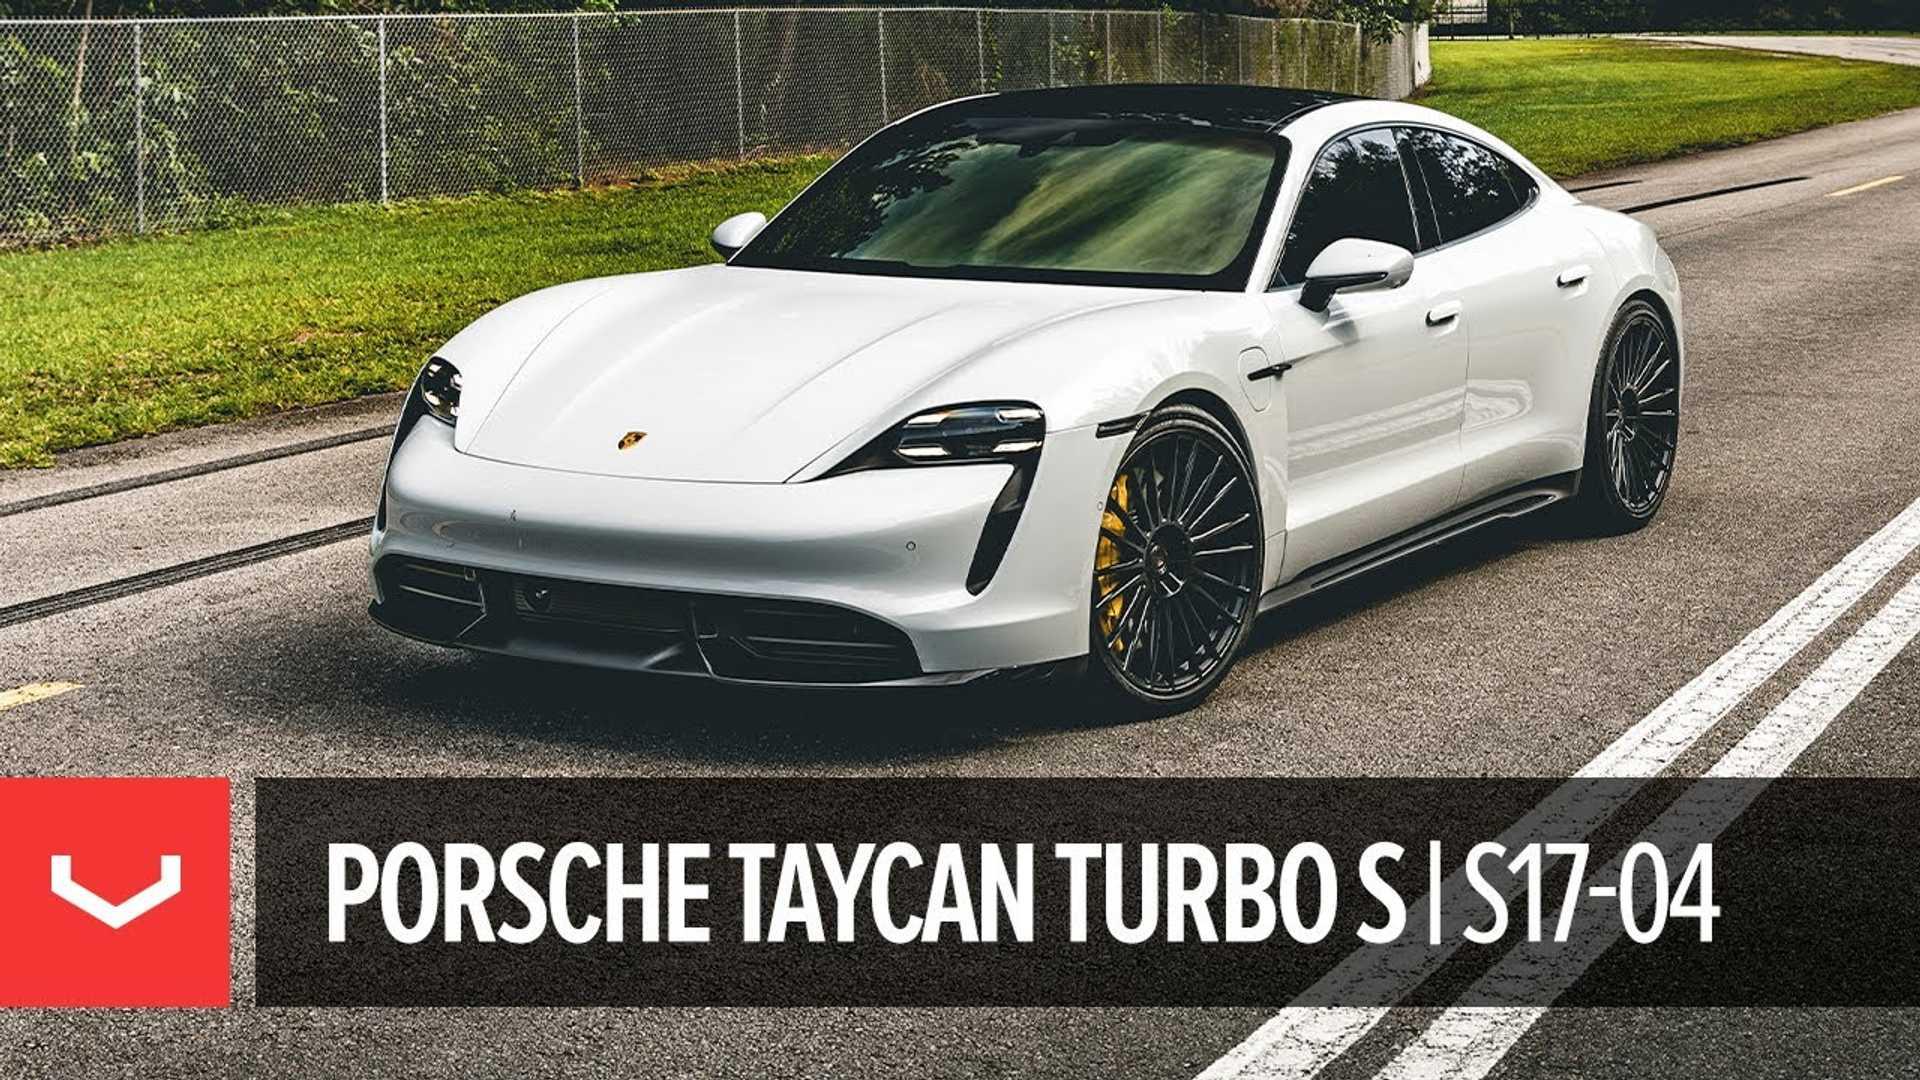 Porsche Taycan Turbo S Look преобразуется этими колесами Vossen